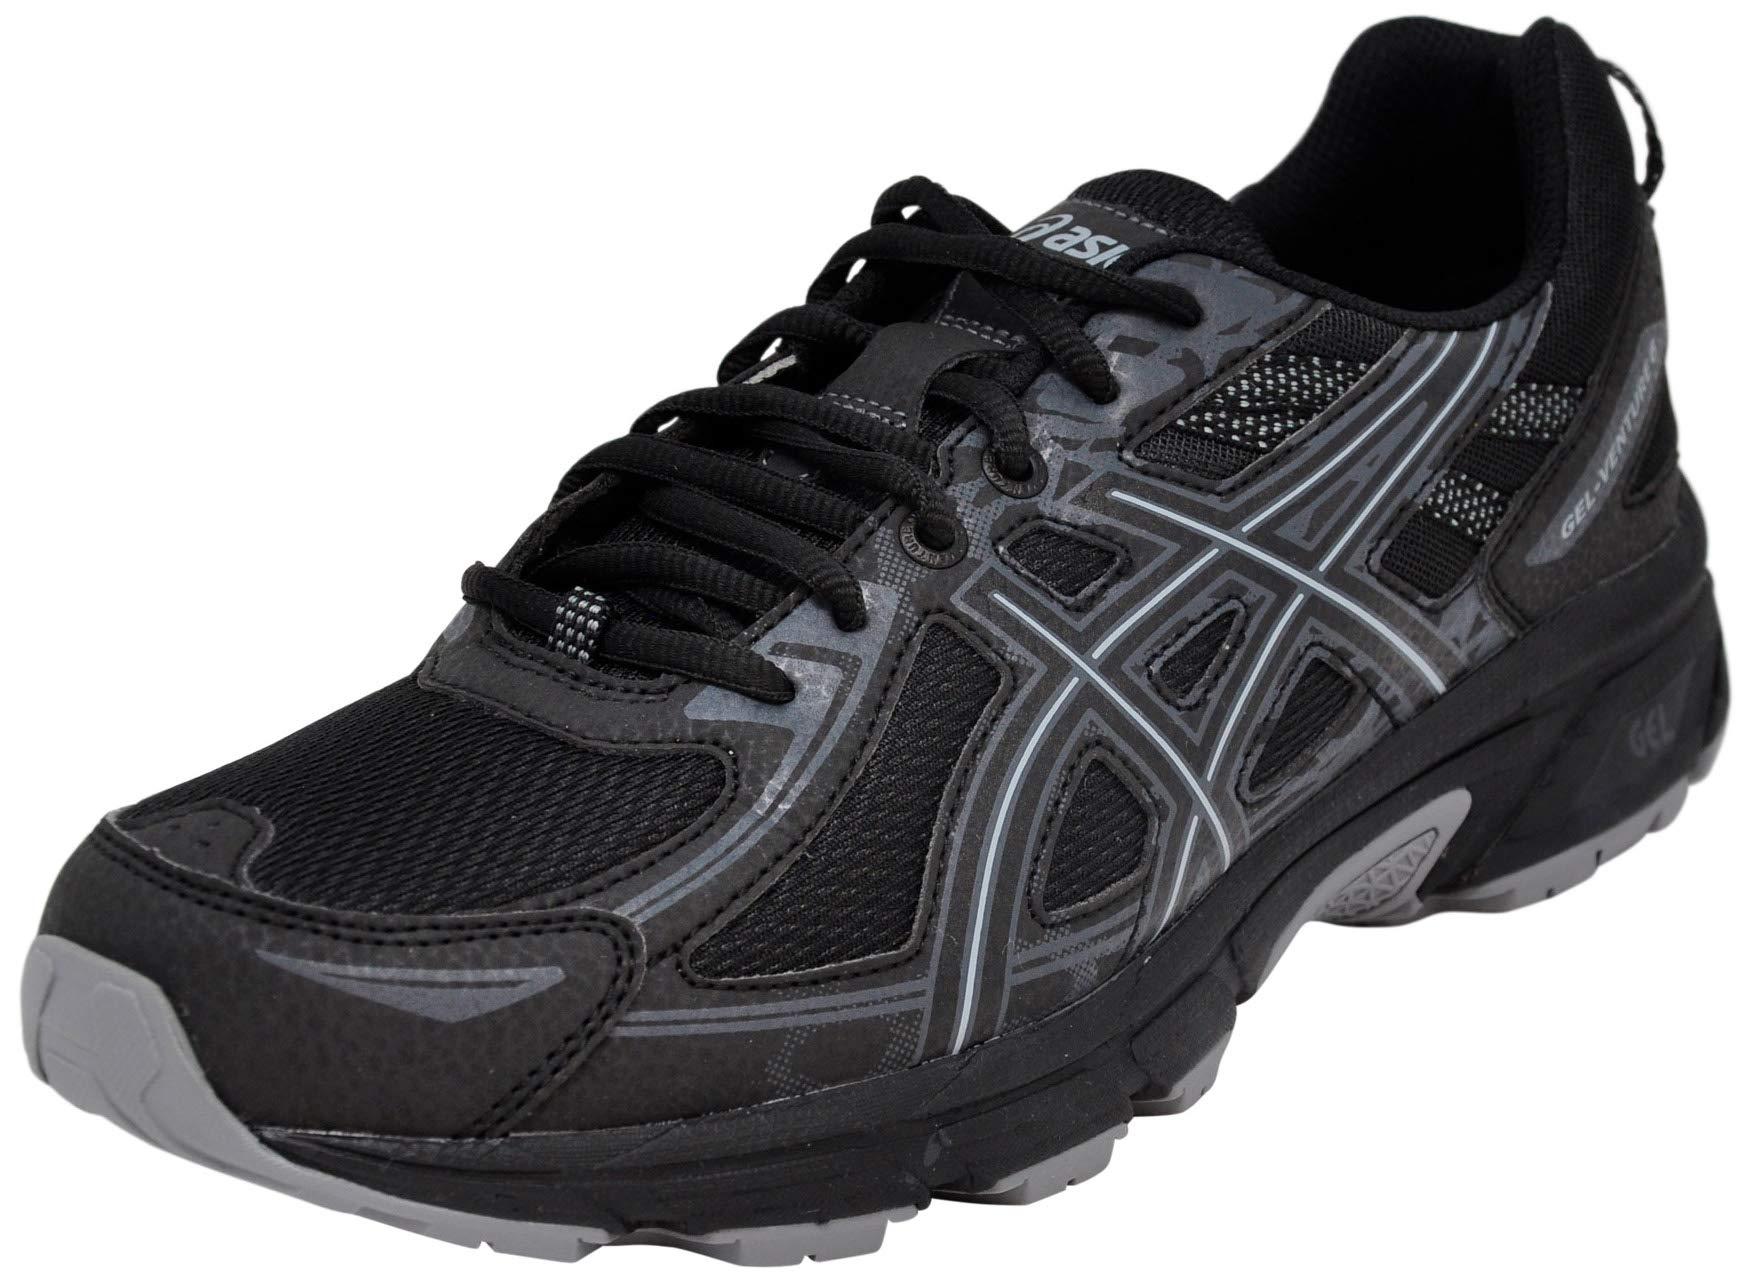 ASICS Men Gel-Venture 6 Running Shoe, Black/Black, 9.5 M US